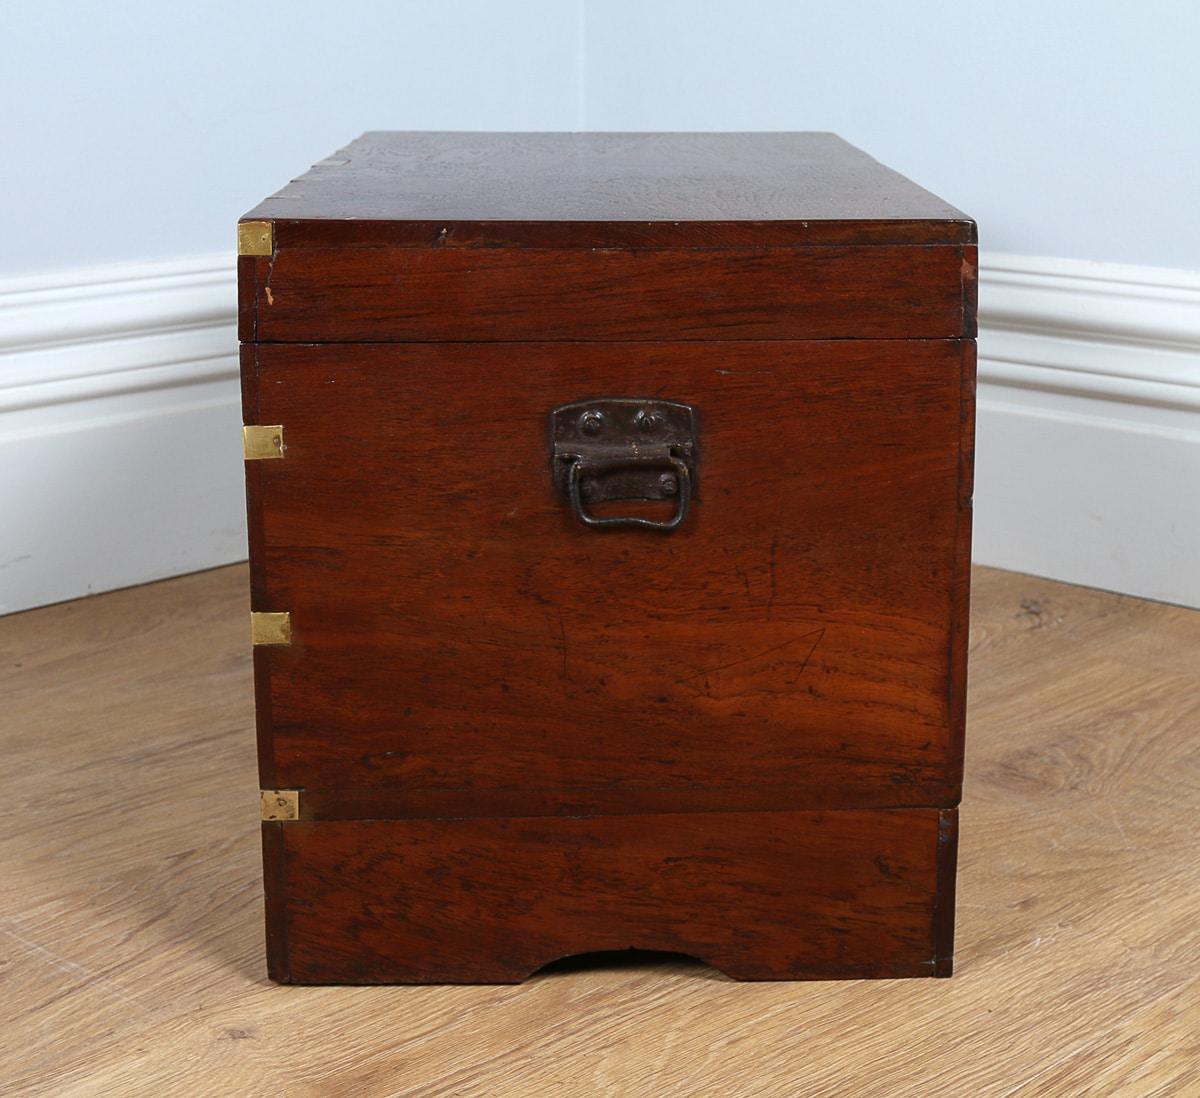 Photo 10 antique furniture four poster beds yolanda for Furniture kelsall